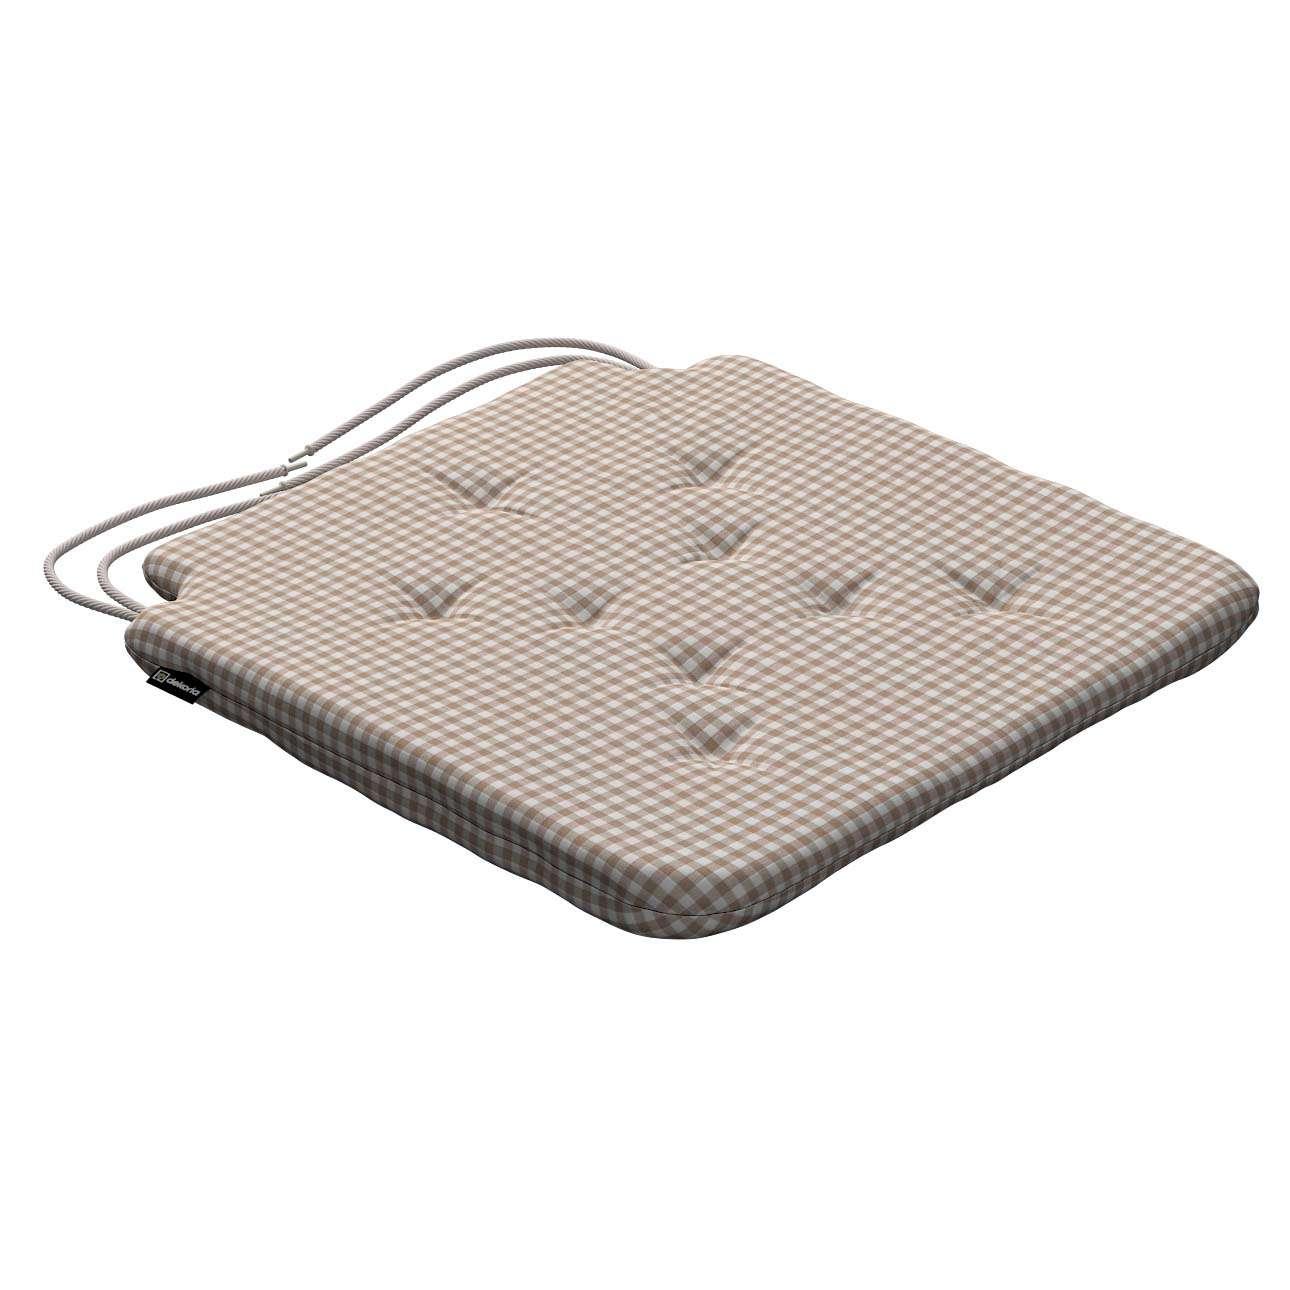 Kėdės pagalvėlė Olek  42 x 41 x 3,5 cm kolekcijoje Quadro, audinys: 136-05